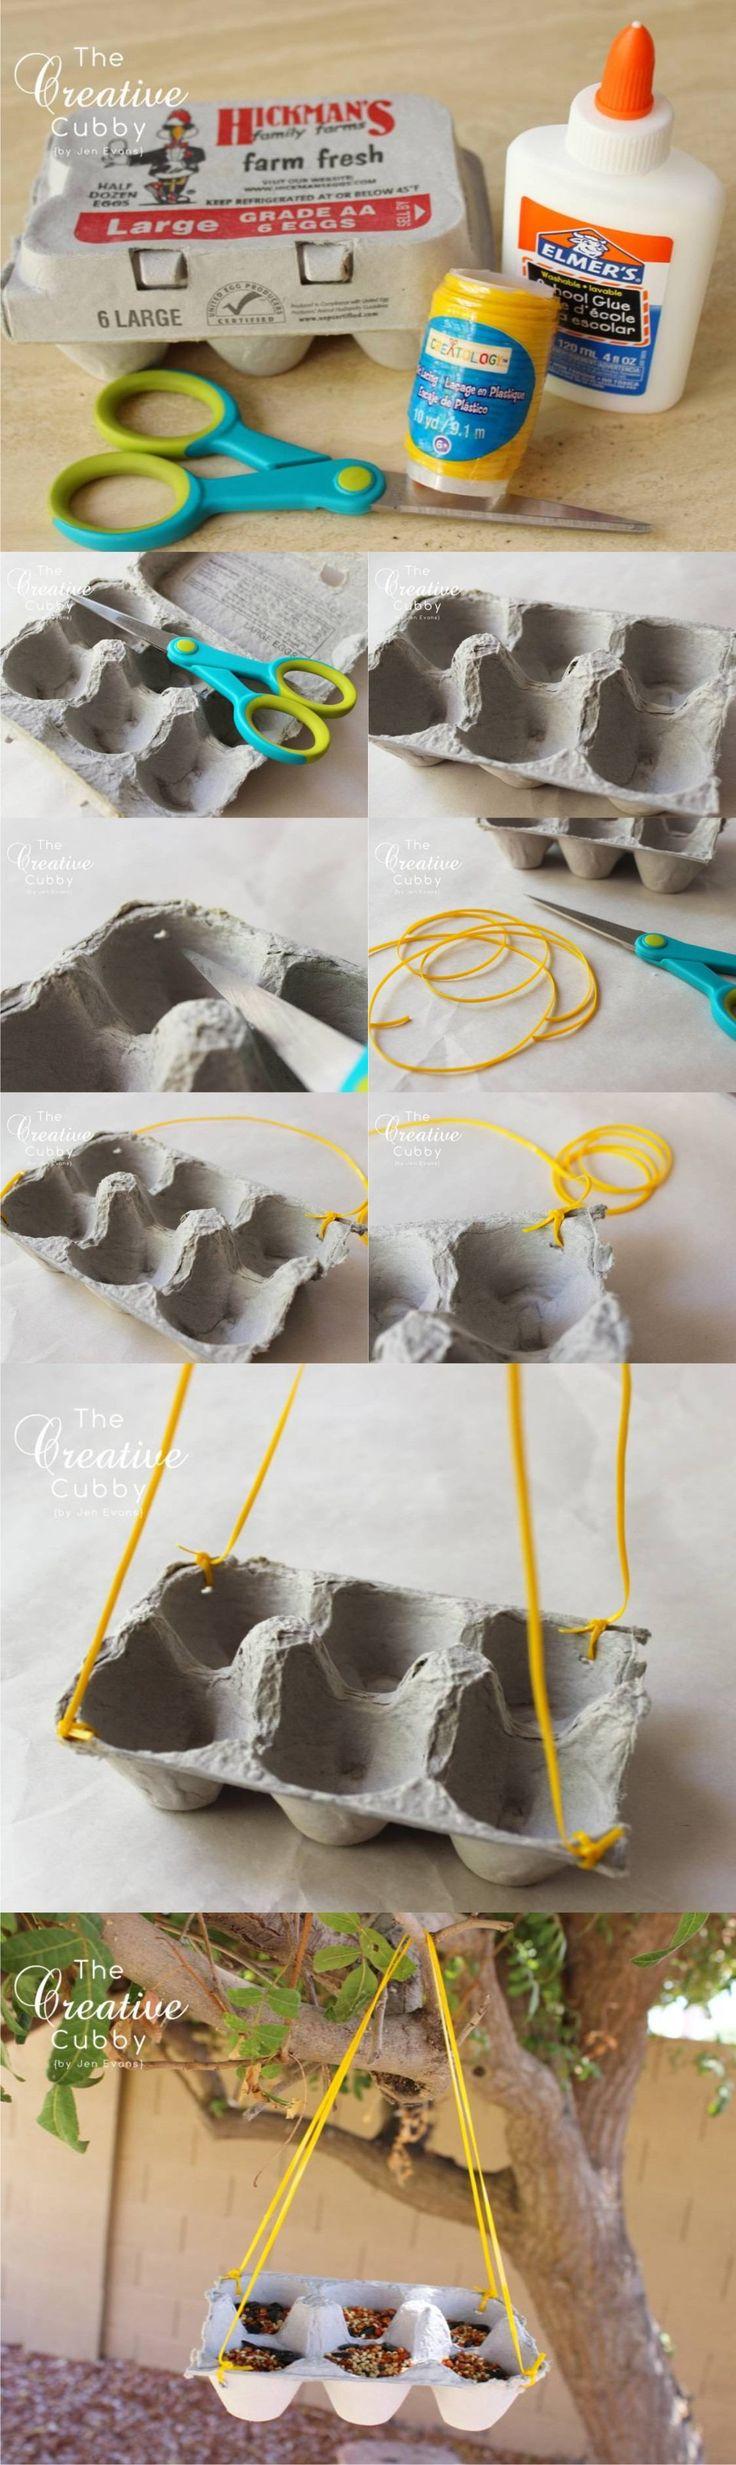 Comedero DIY para pájaros - thecreativecubby.blogspot.com